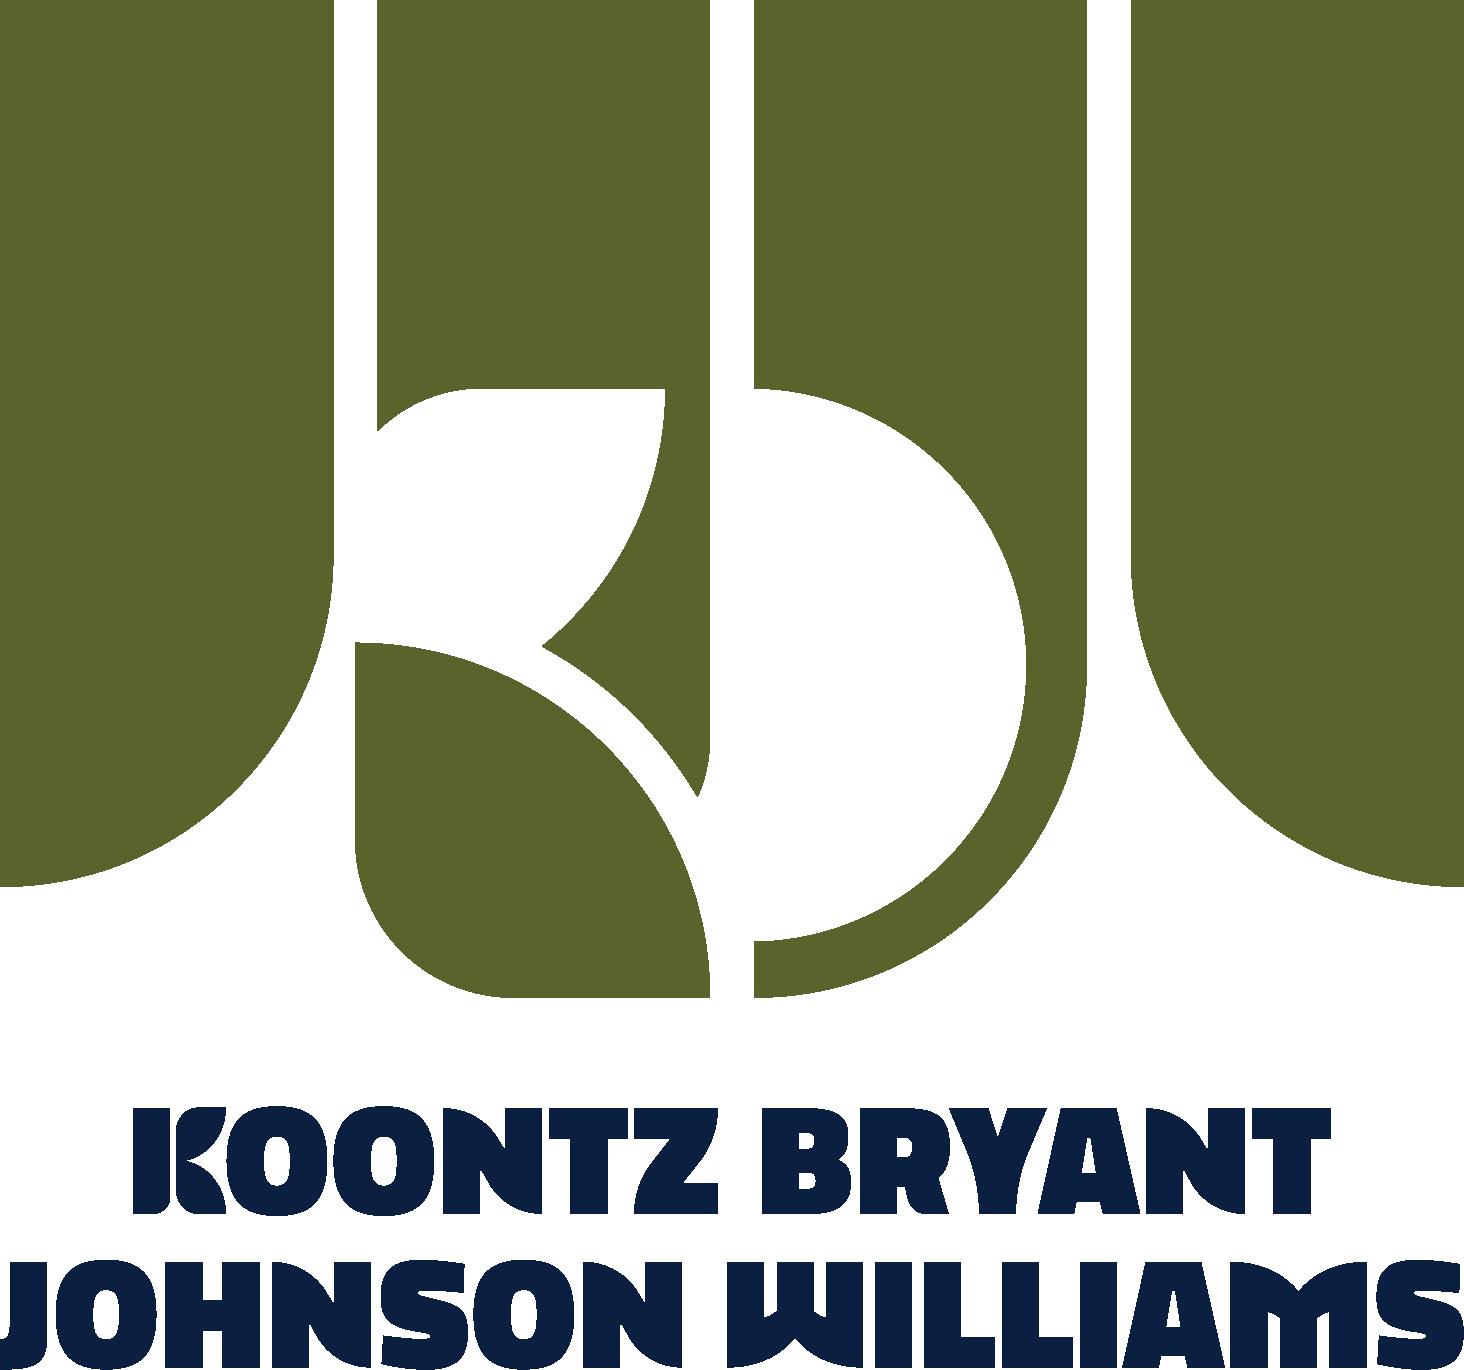 Koontz Bryant Johnson Williams Company Logo